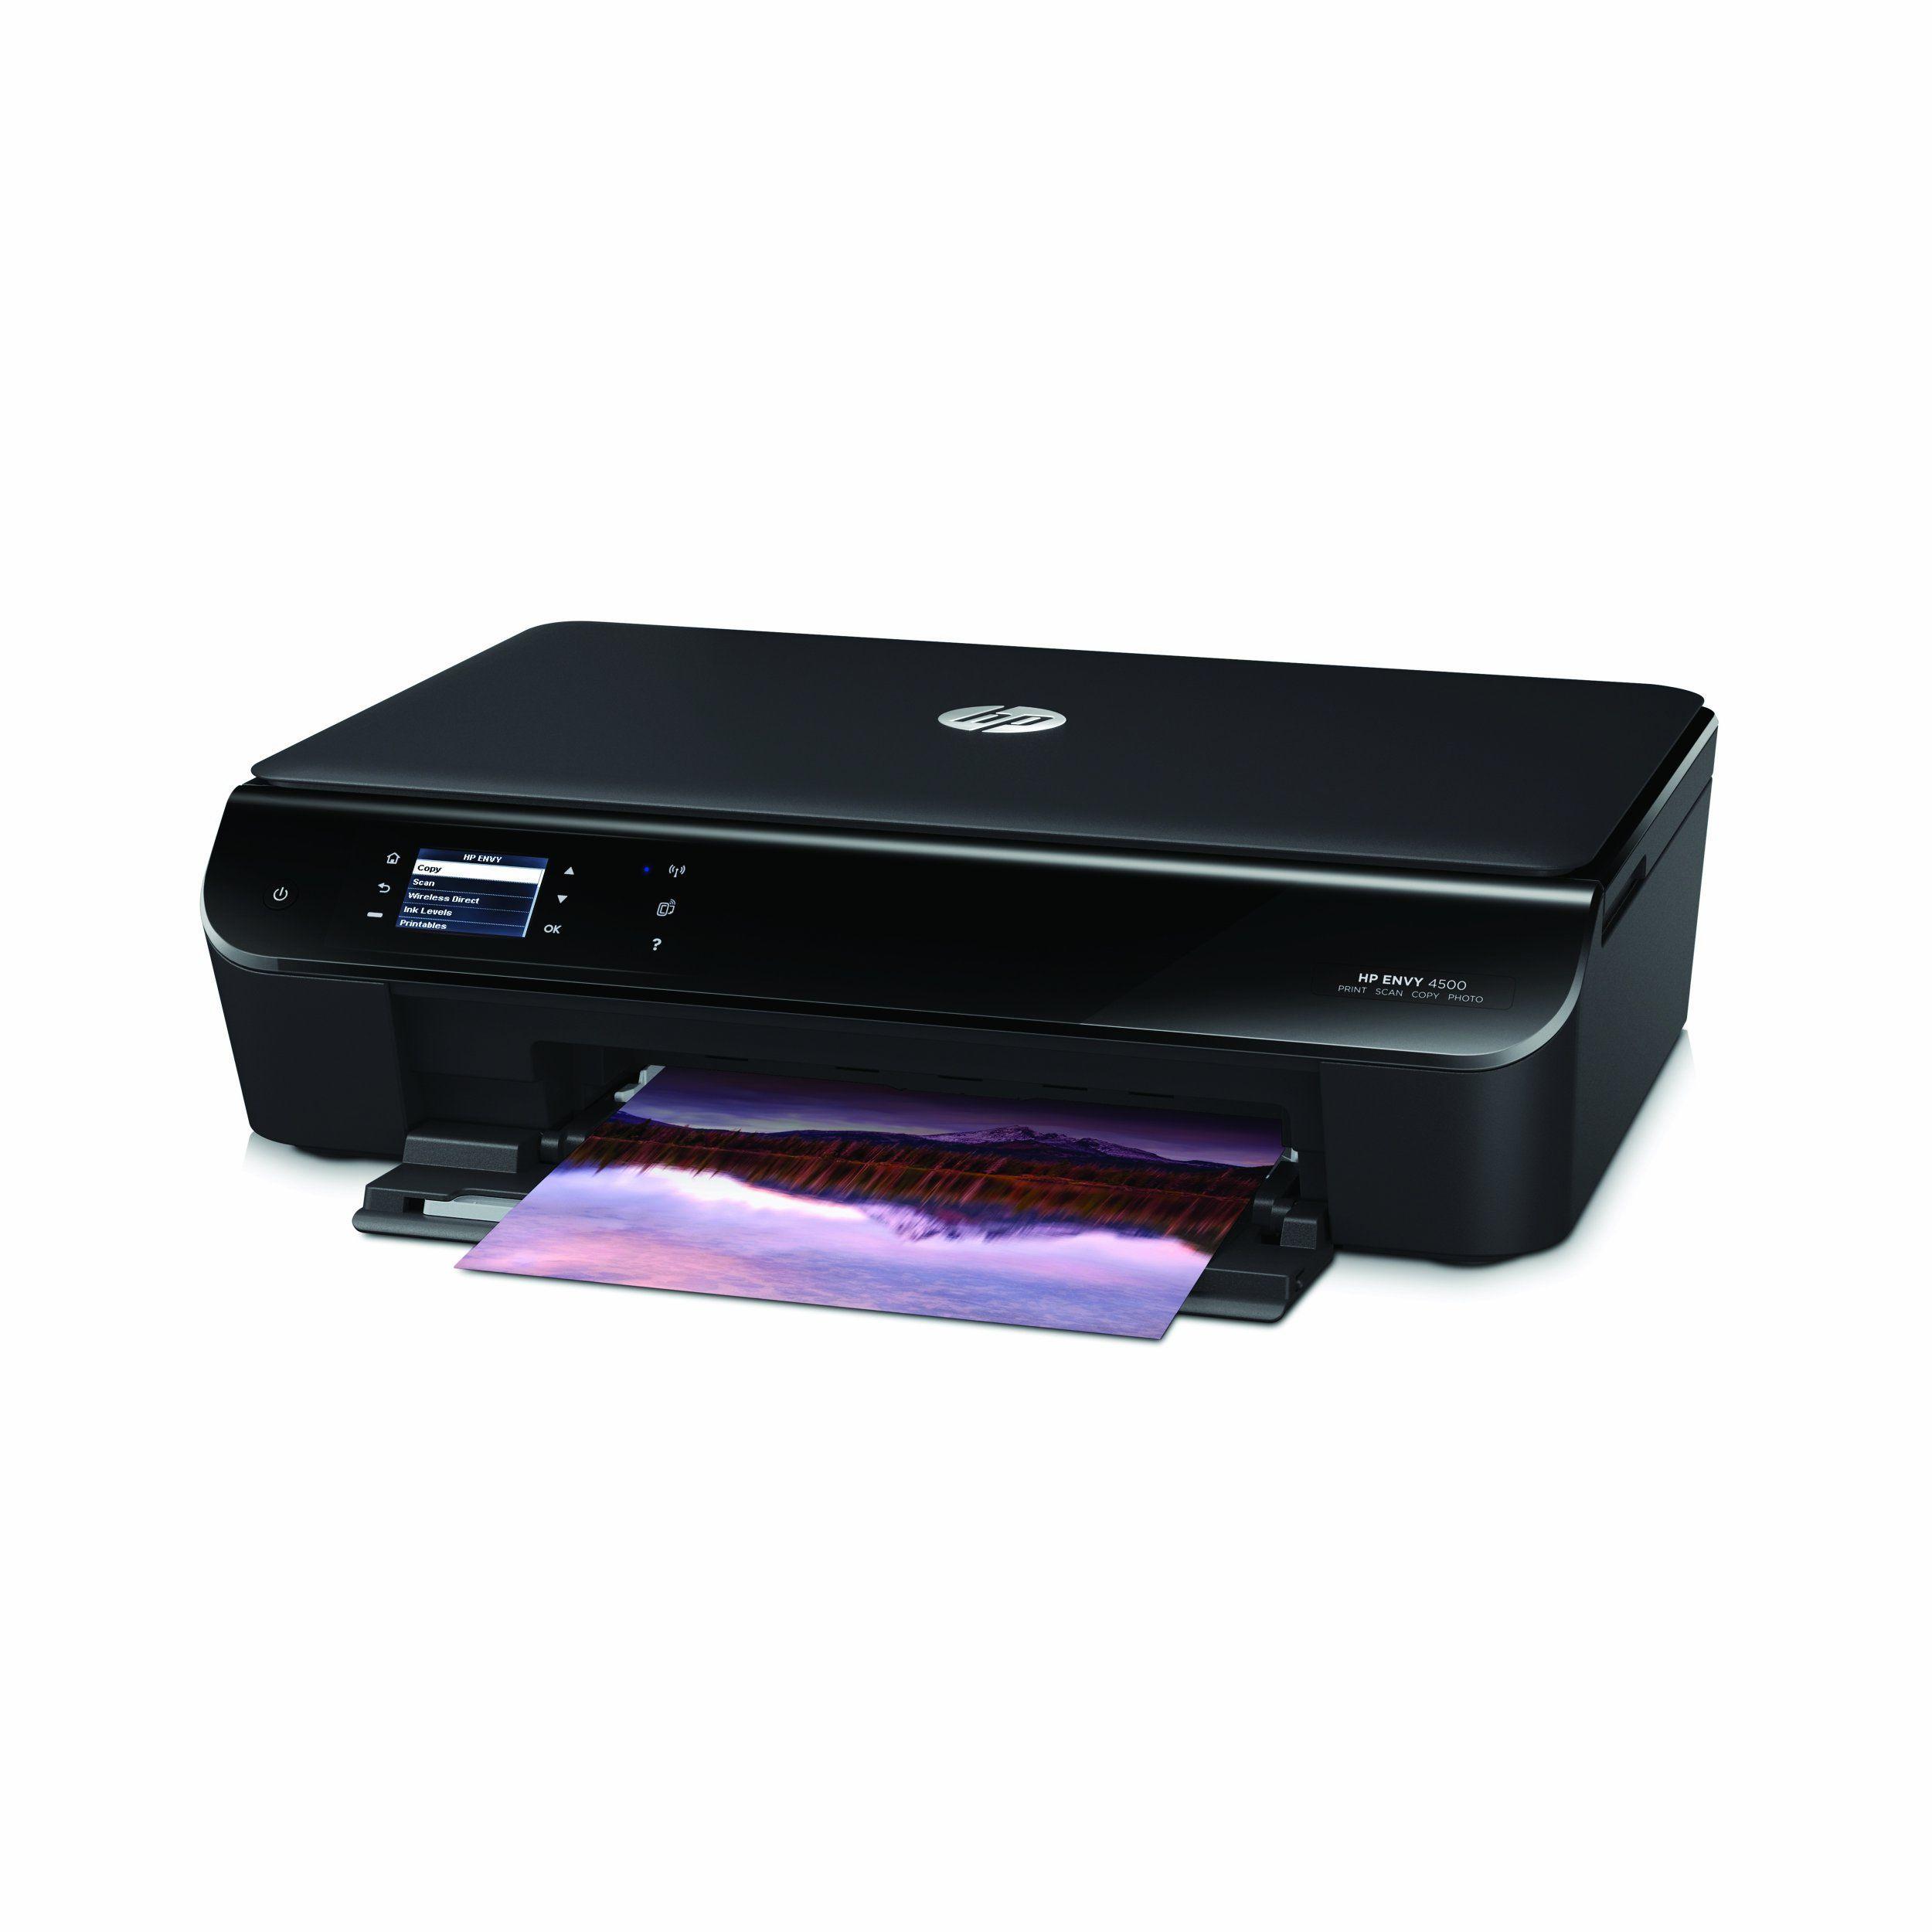 Amazon.com: HP Envy 4500 Wireless Color Photo Printer With